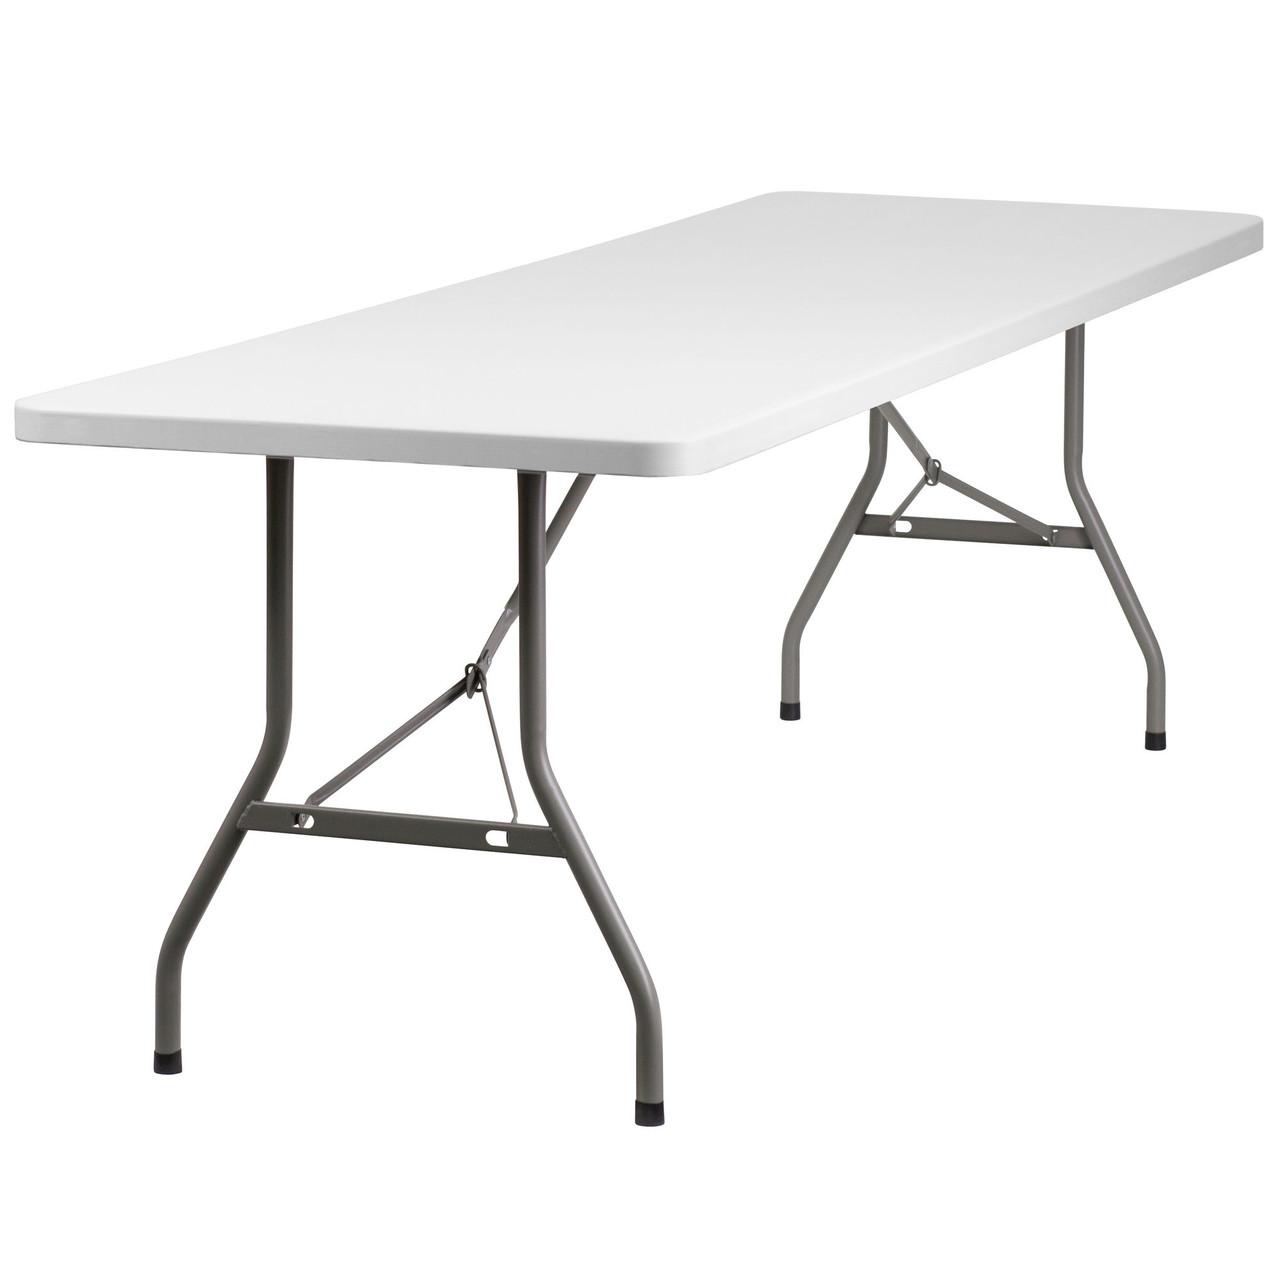 - 8 Ft Lightweight Plastic Folding Table [RB-3096-GG